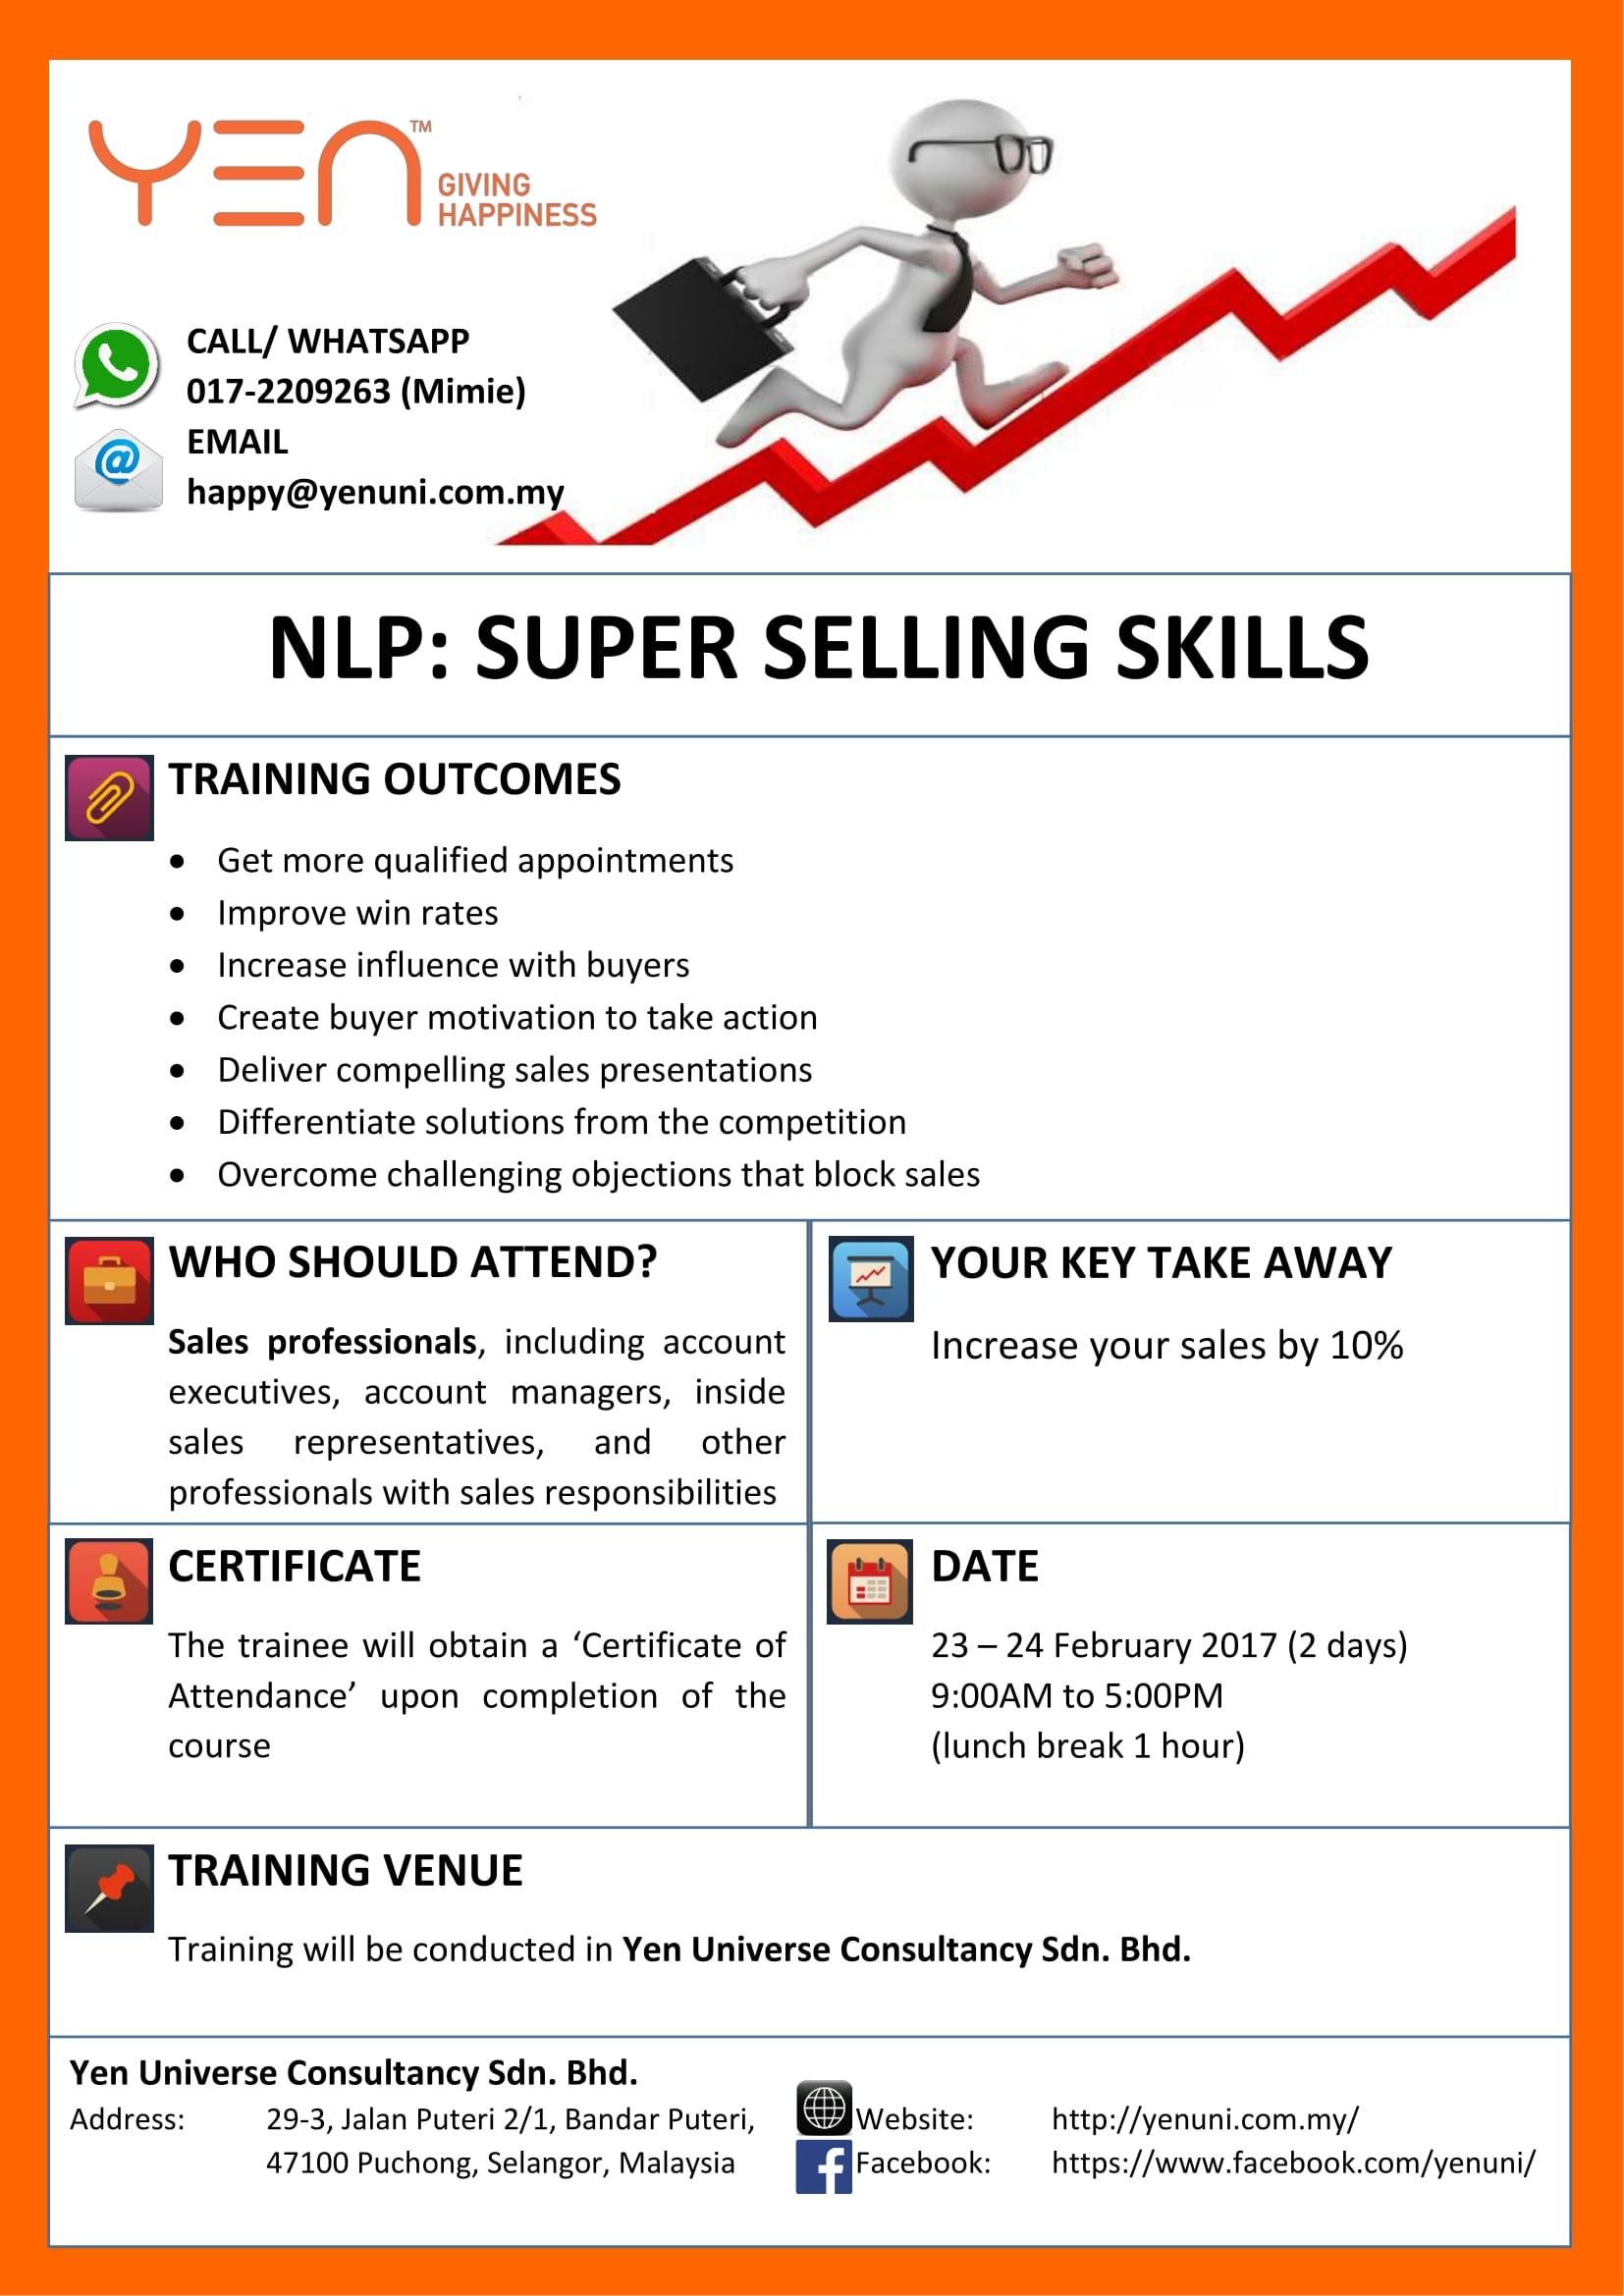 nlp-super-selling-skills-